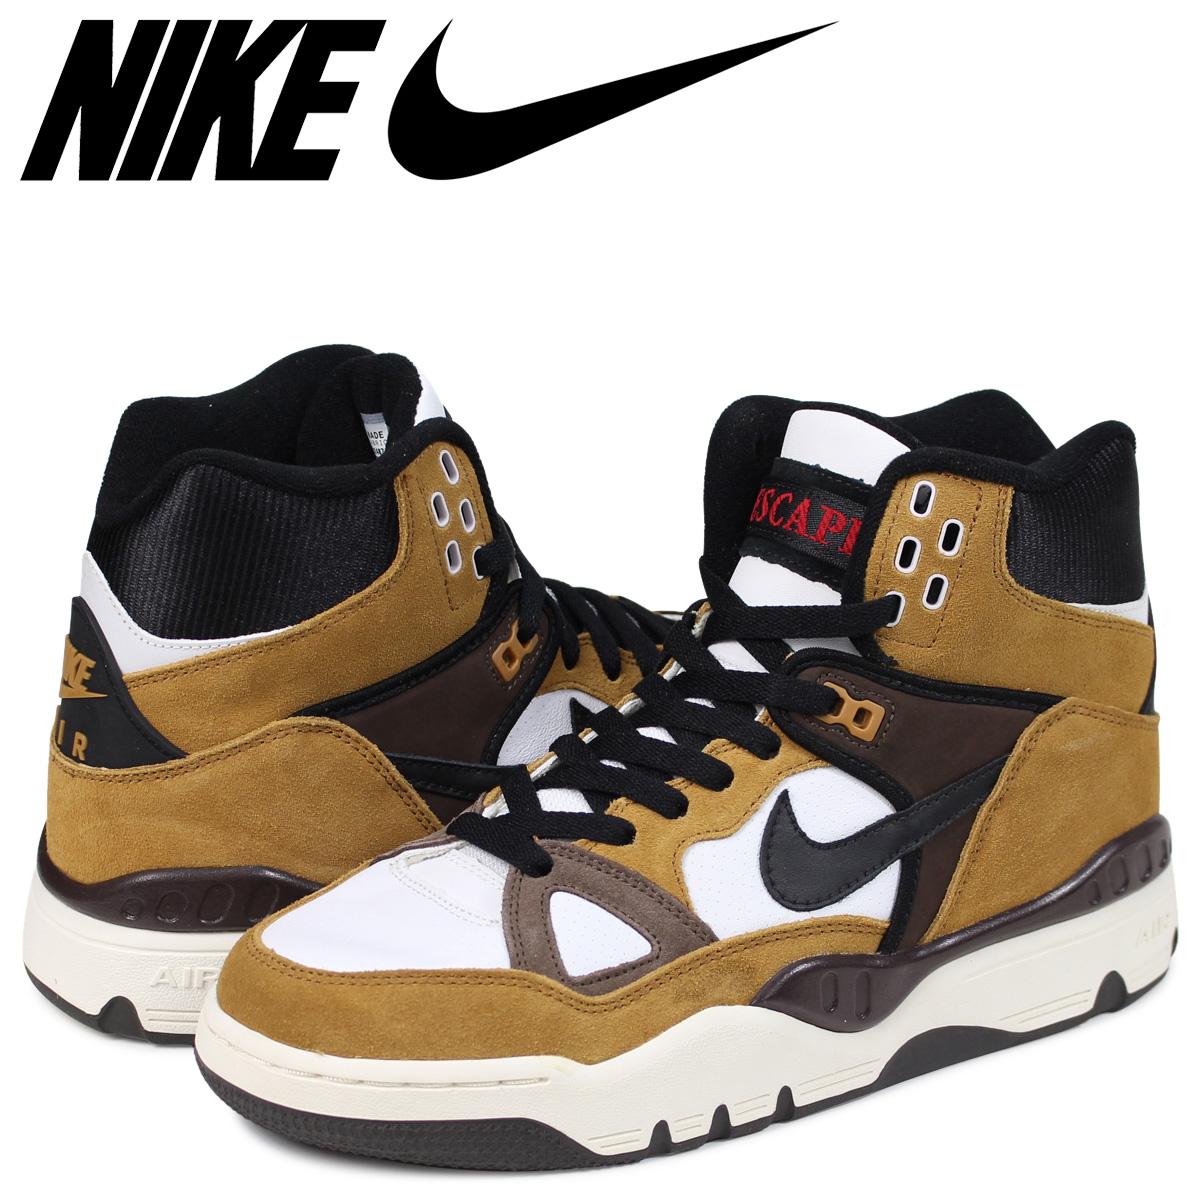 487 Brown Premium 101 Air Sneakers Men Nike Force Hi 312 3 Escape yvN80Omnw